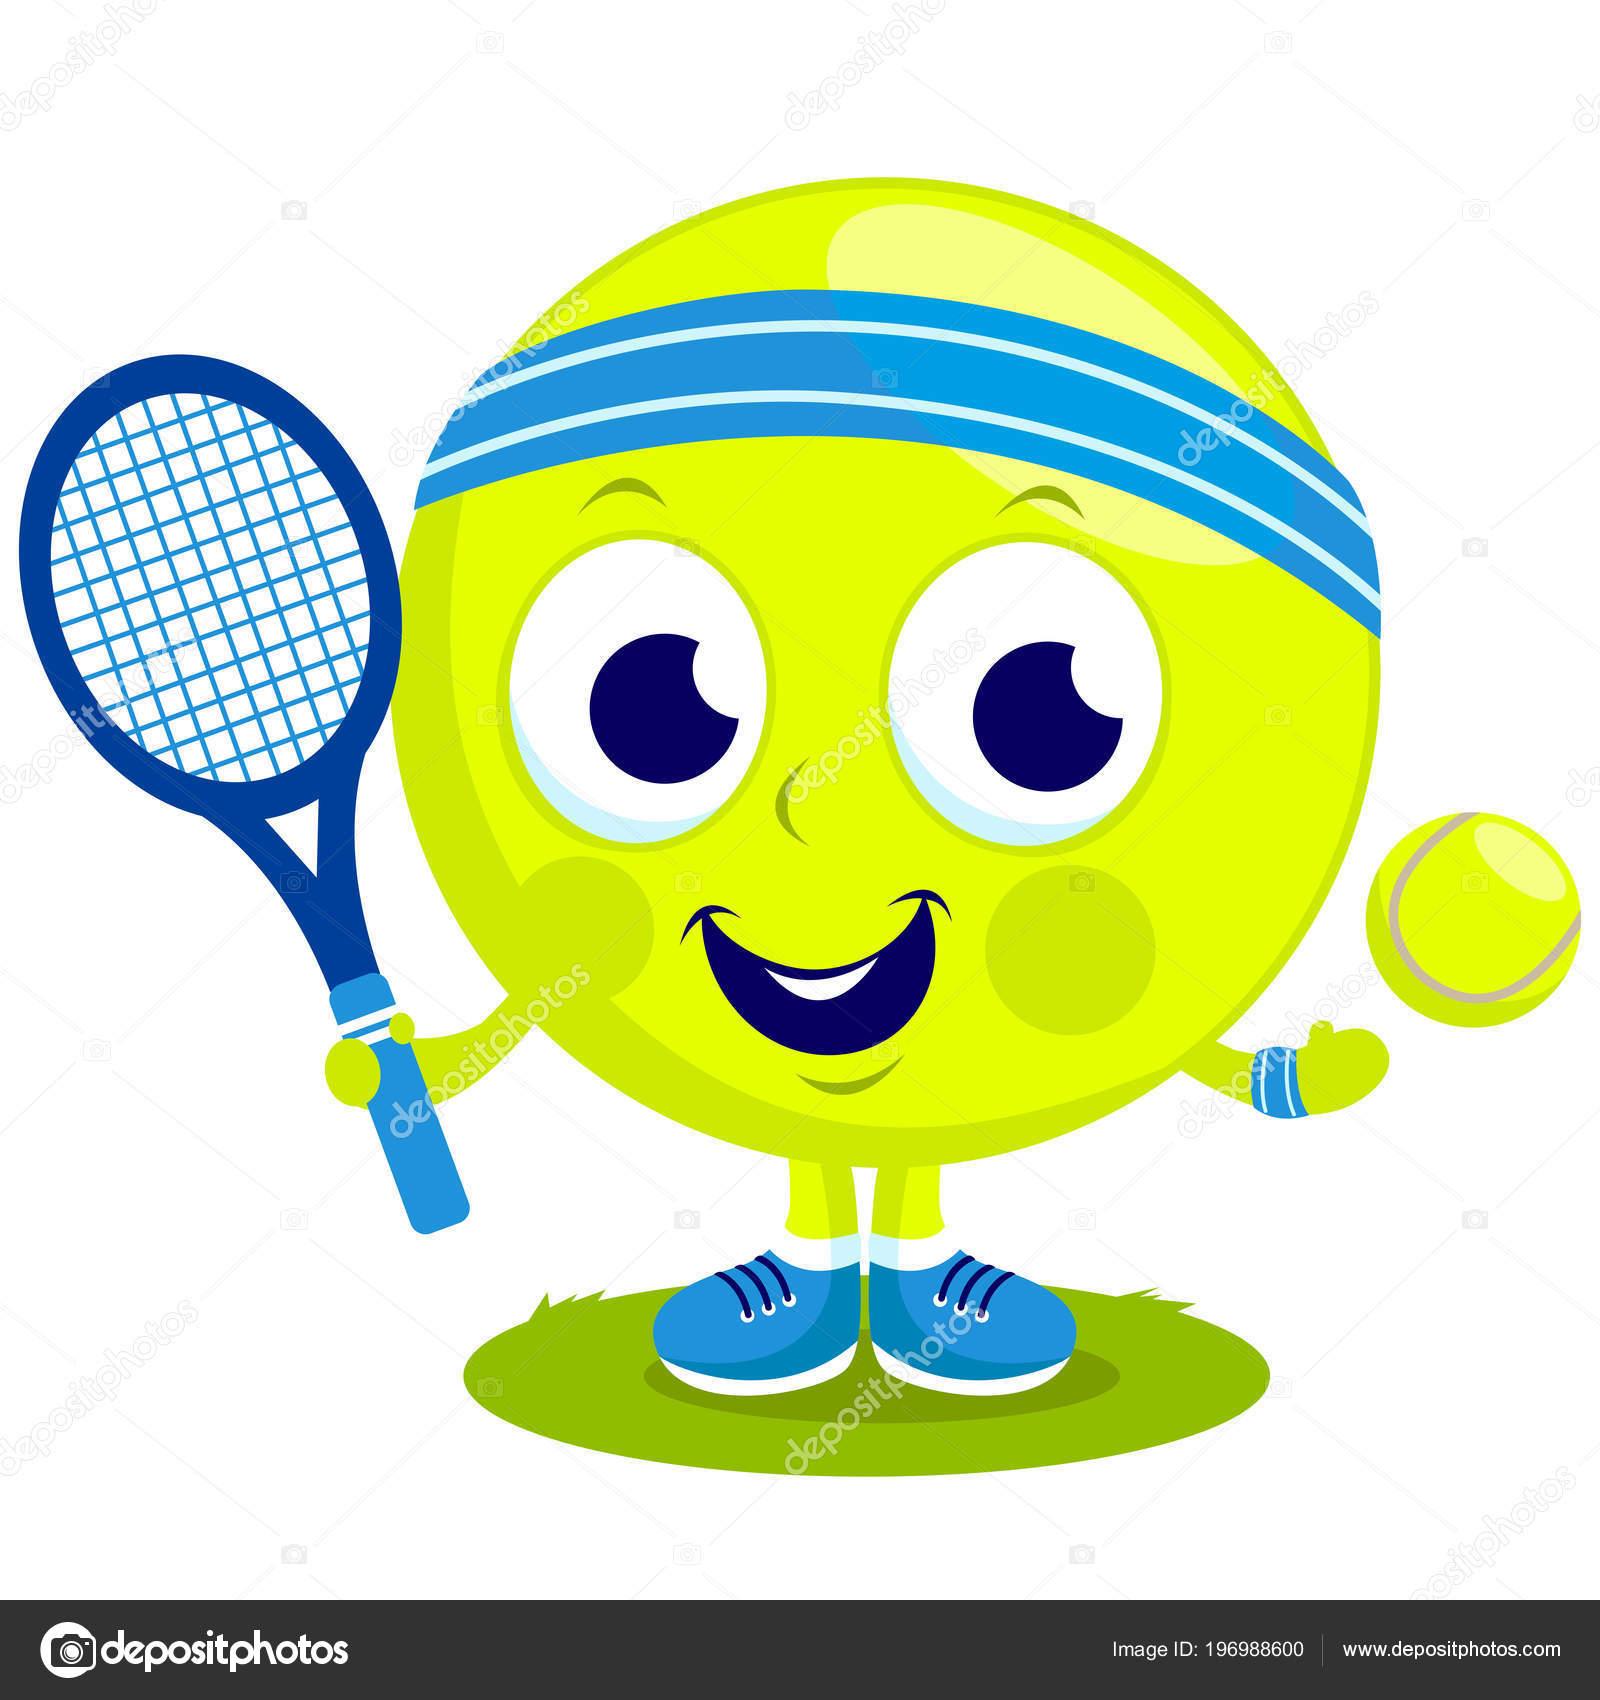 Vector Cartoon Tennis Ball Character Playing Tennis Racket Tennis